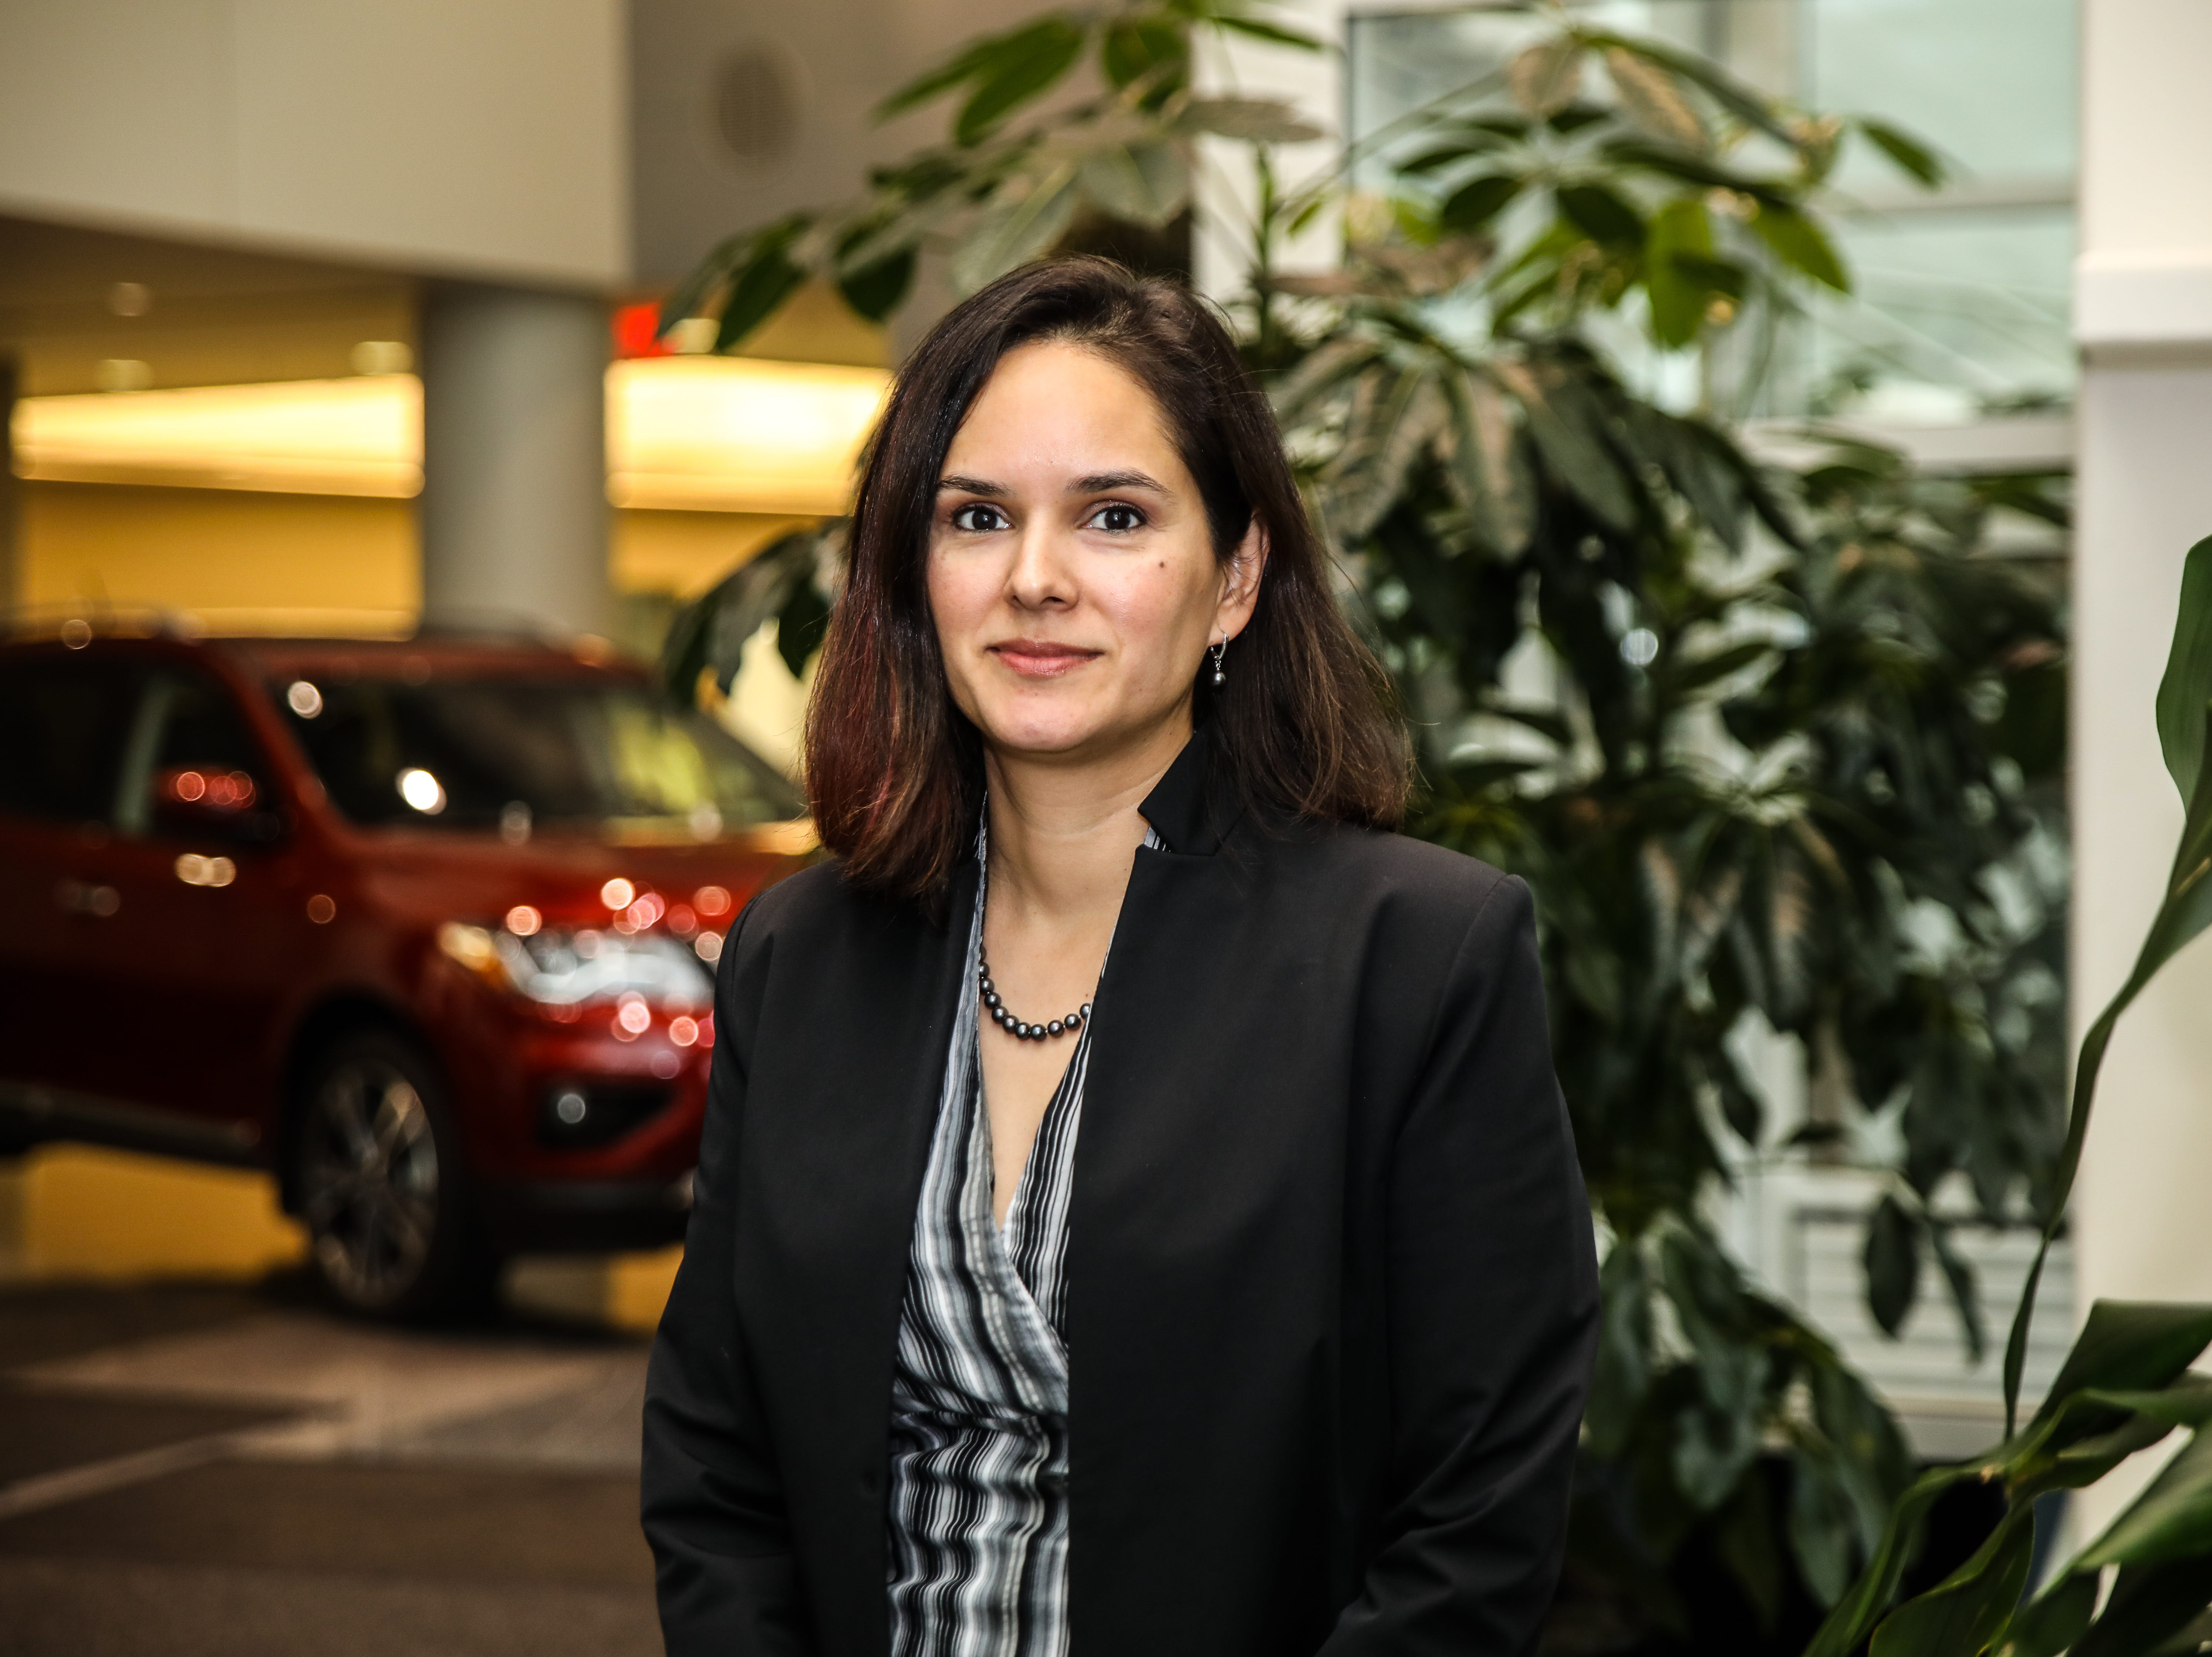 Nissan engineer Marlene Mendoza co-developed a rear-door alert system for the automaker.